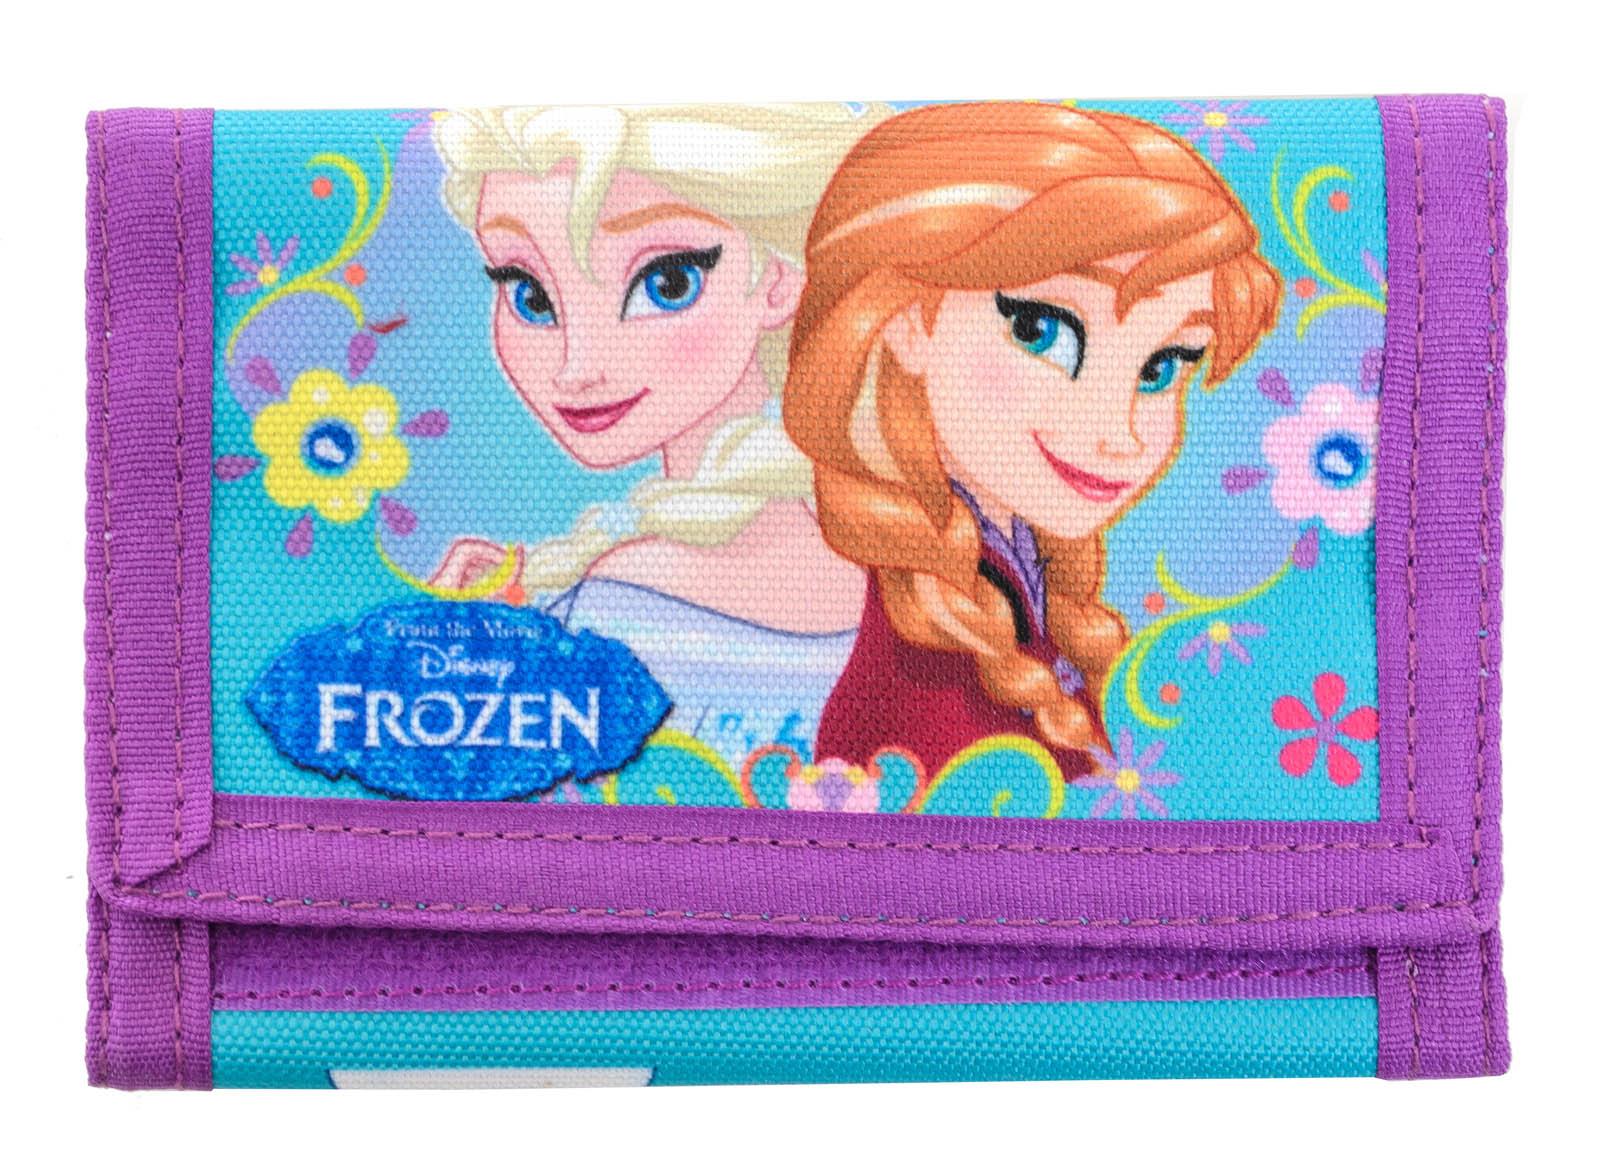 Кошелек Frozen mint, 24.5*12